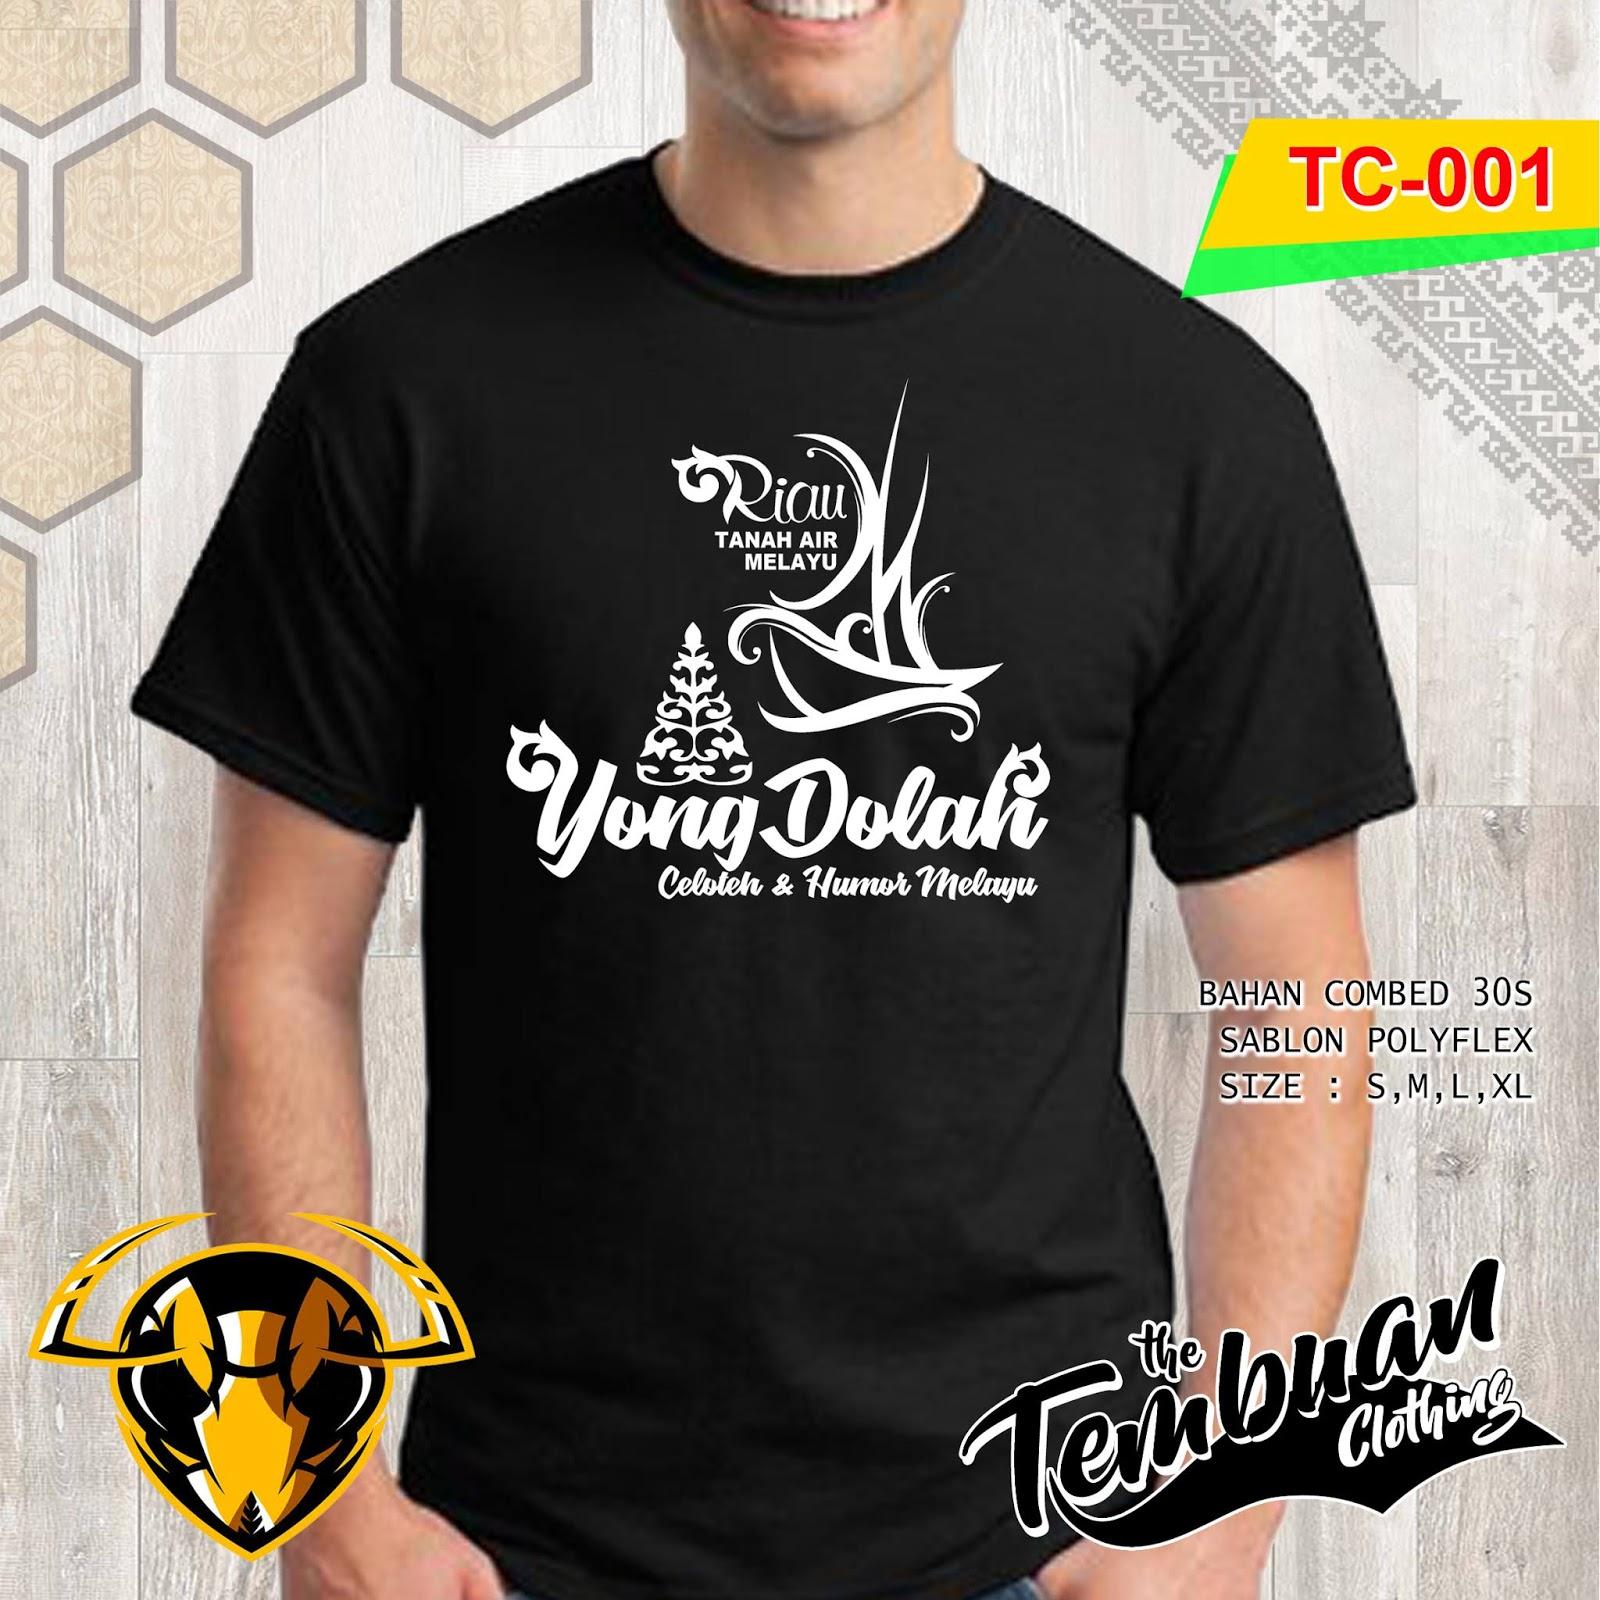 Tembuan Clothing - TC-001 (Yong Dolah Pekanbaru)